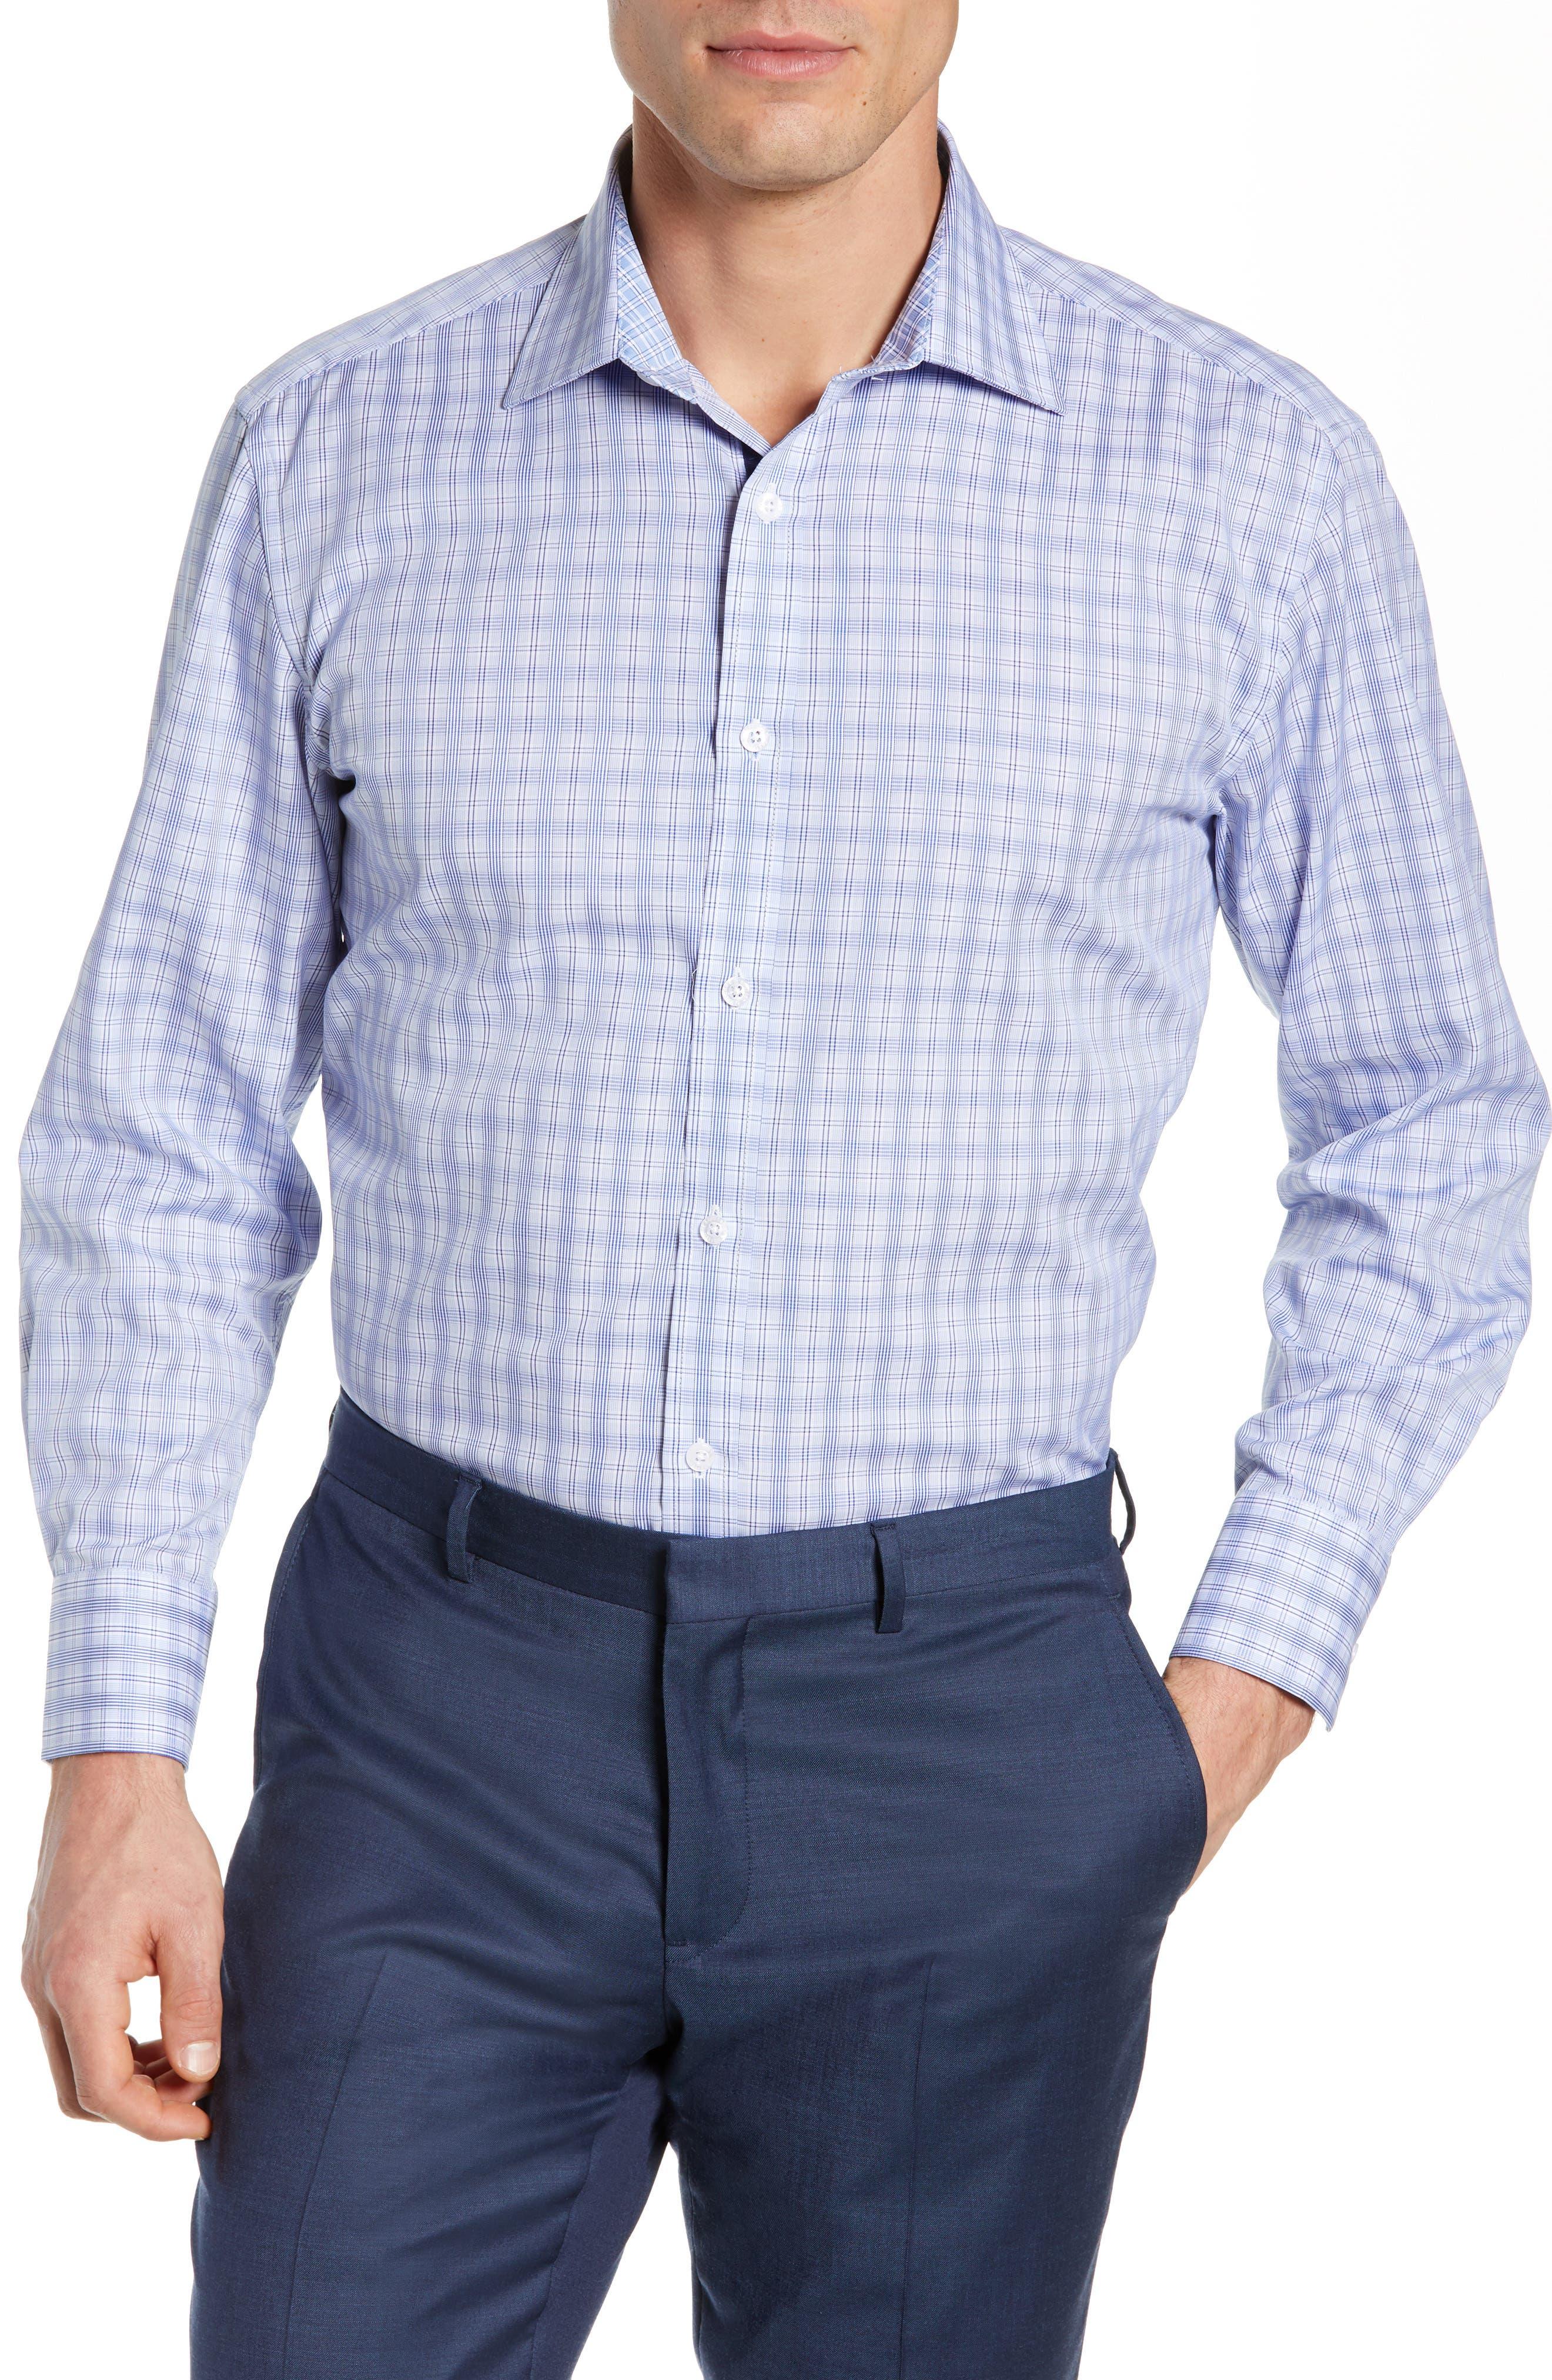 ENGLISH LAUNDRY Regular Fit Plaid Dress Shirt in Blue